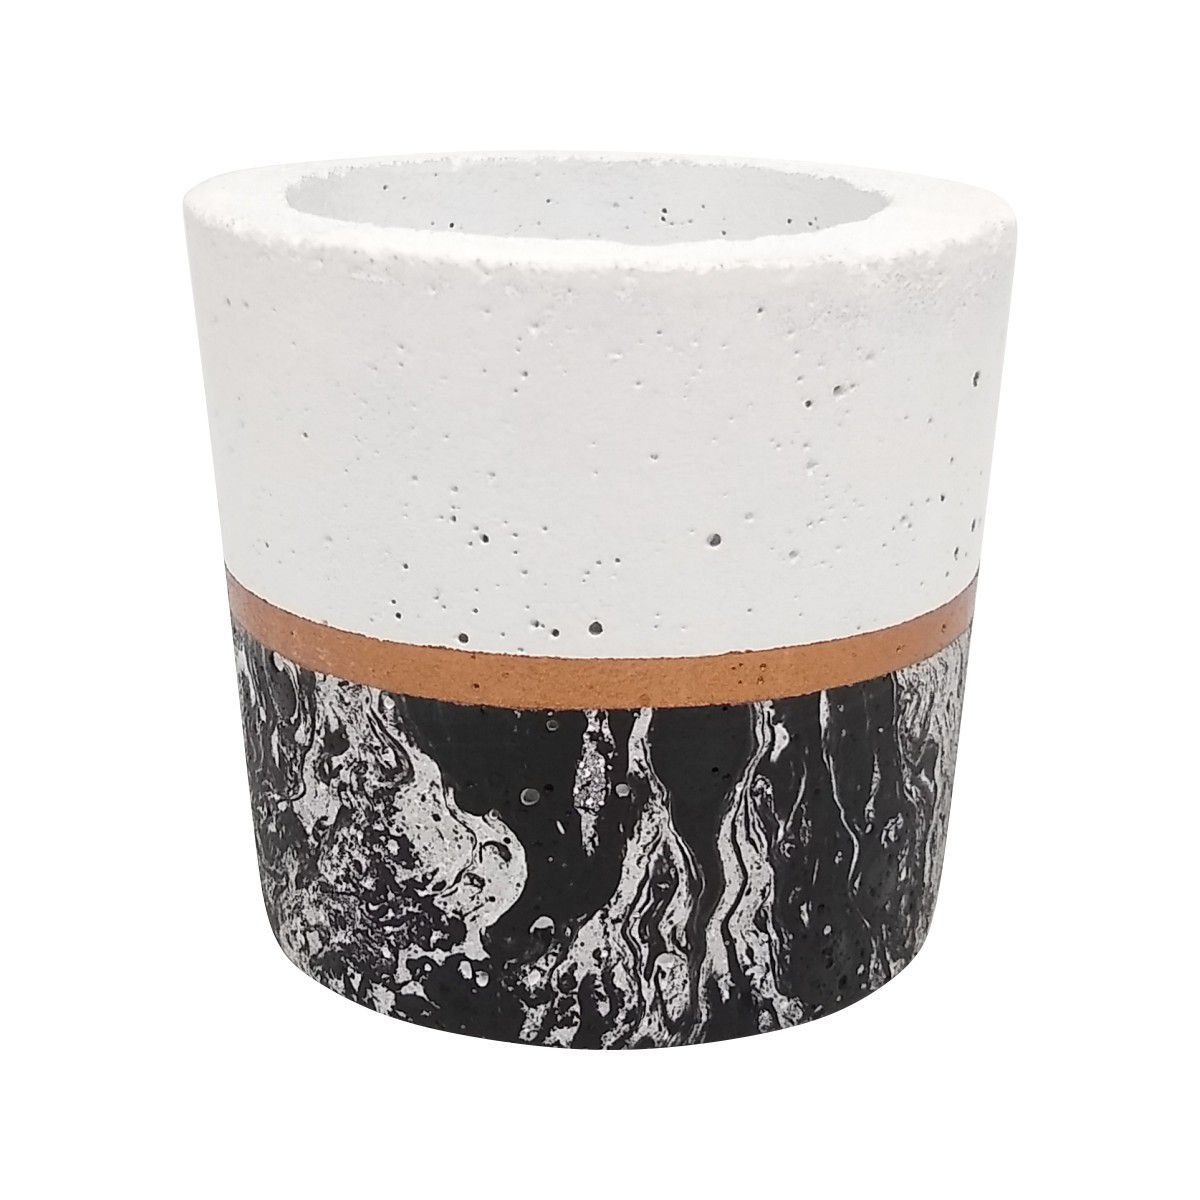 Vaso de Cimento 7,5 cm x 8,5 cm MD25